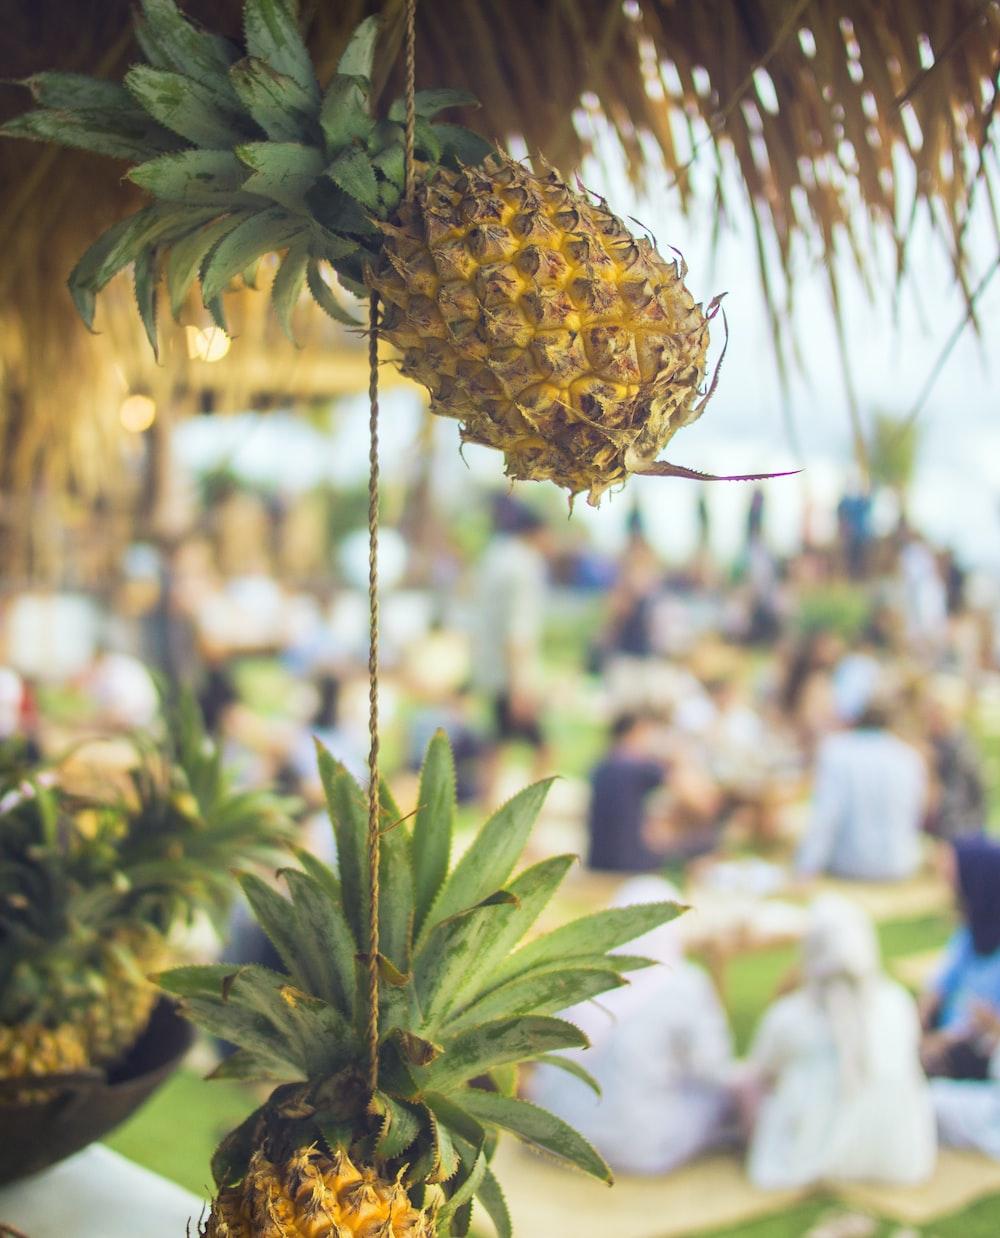 hanged pineapple fruits